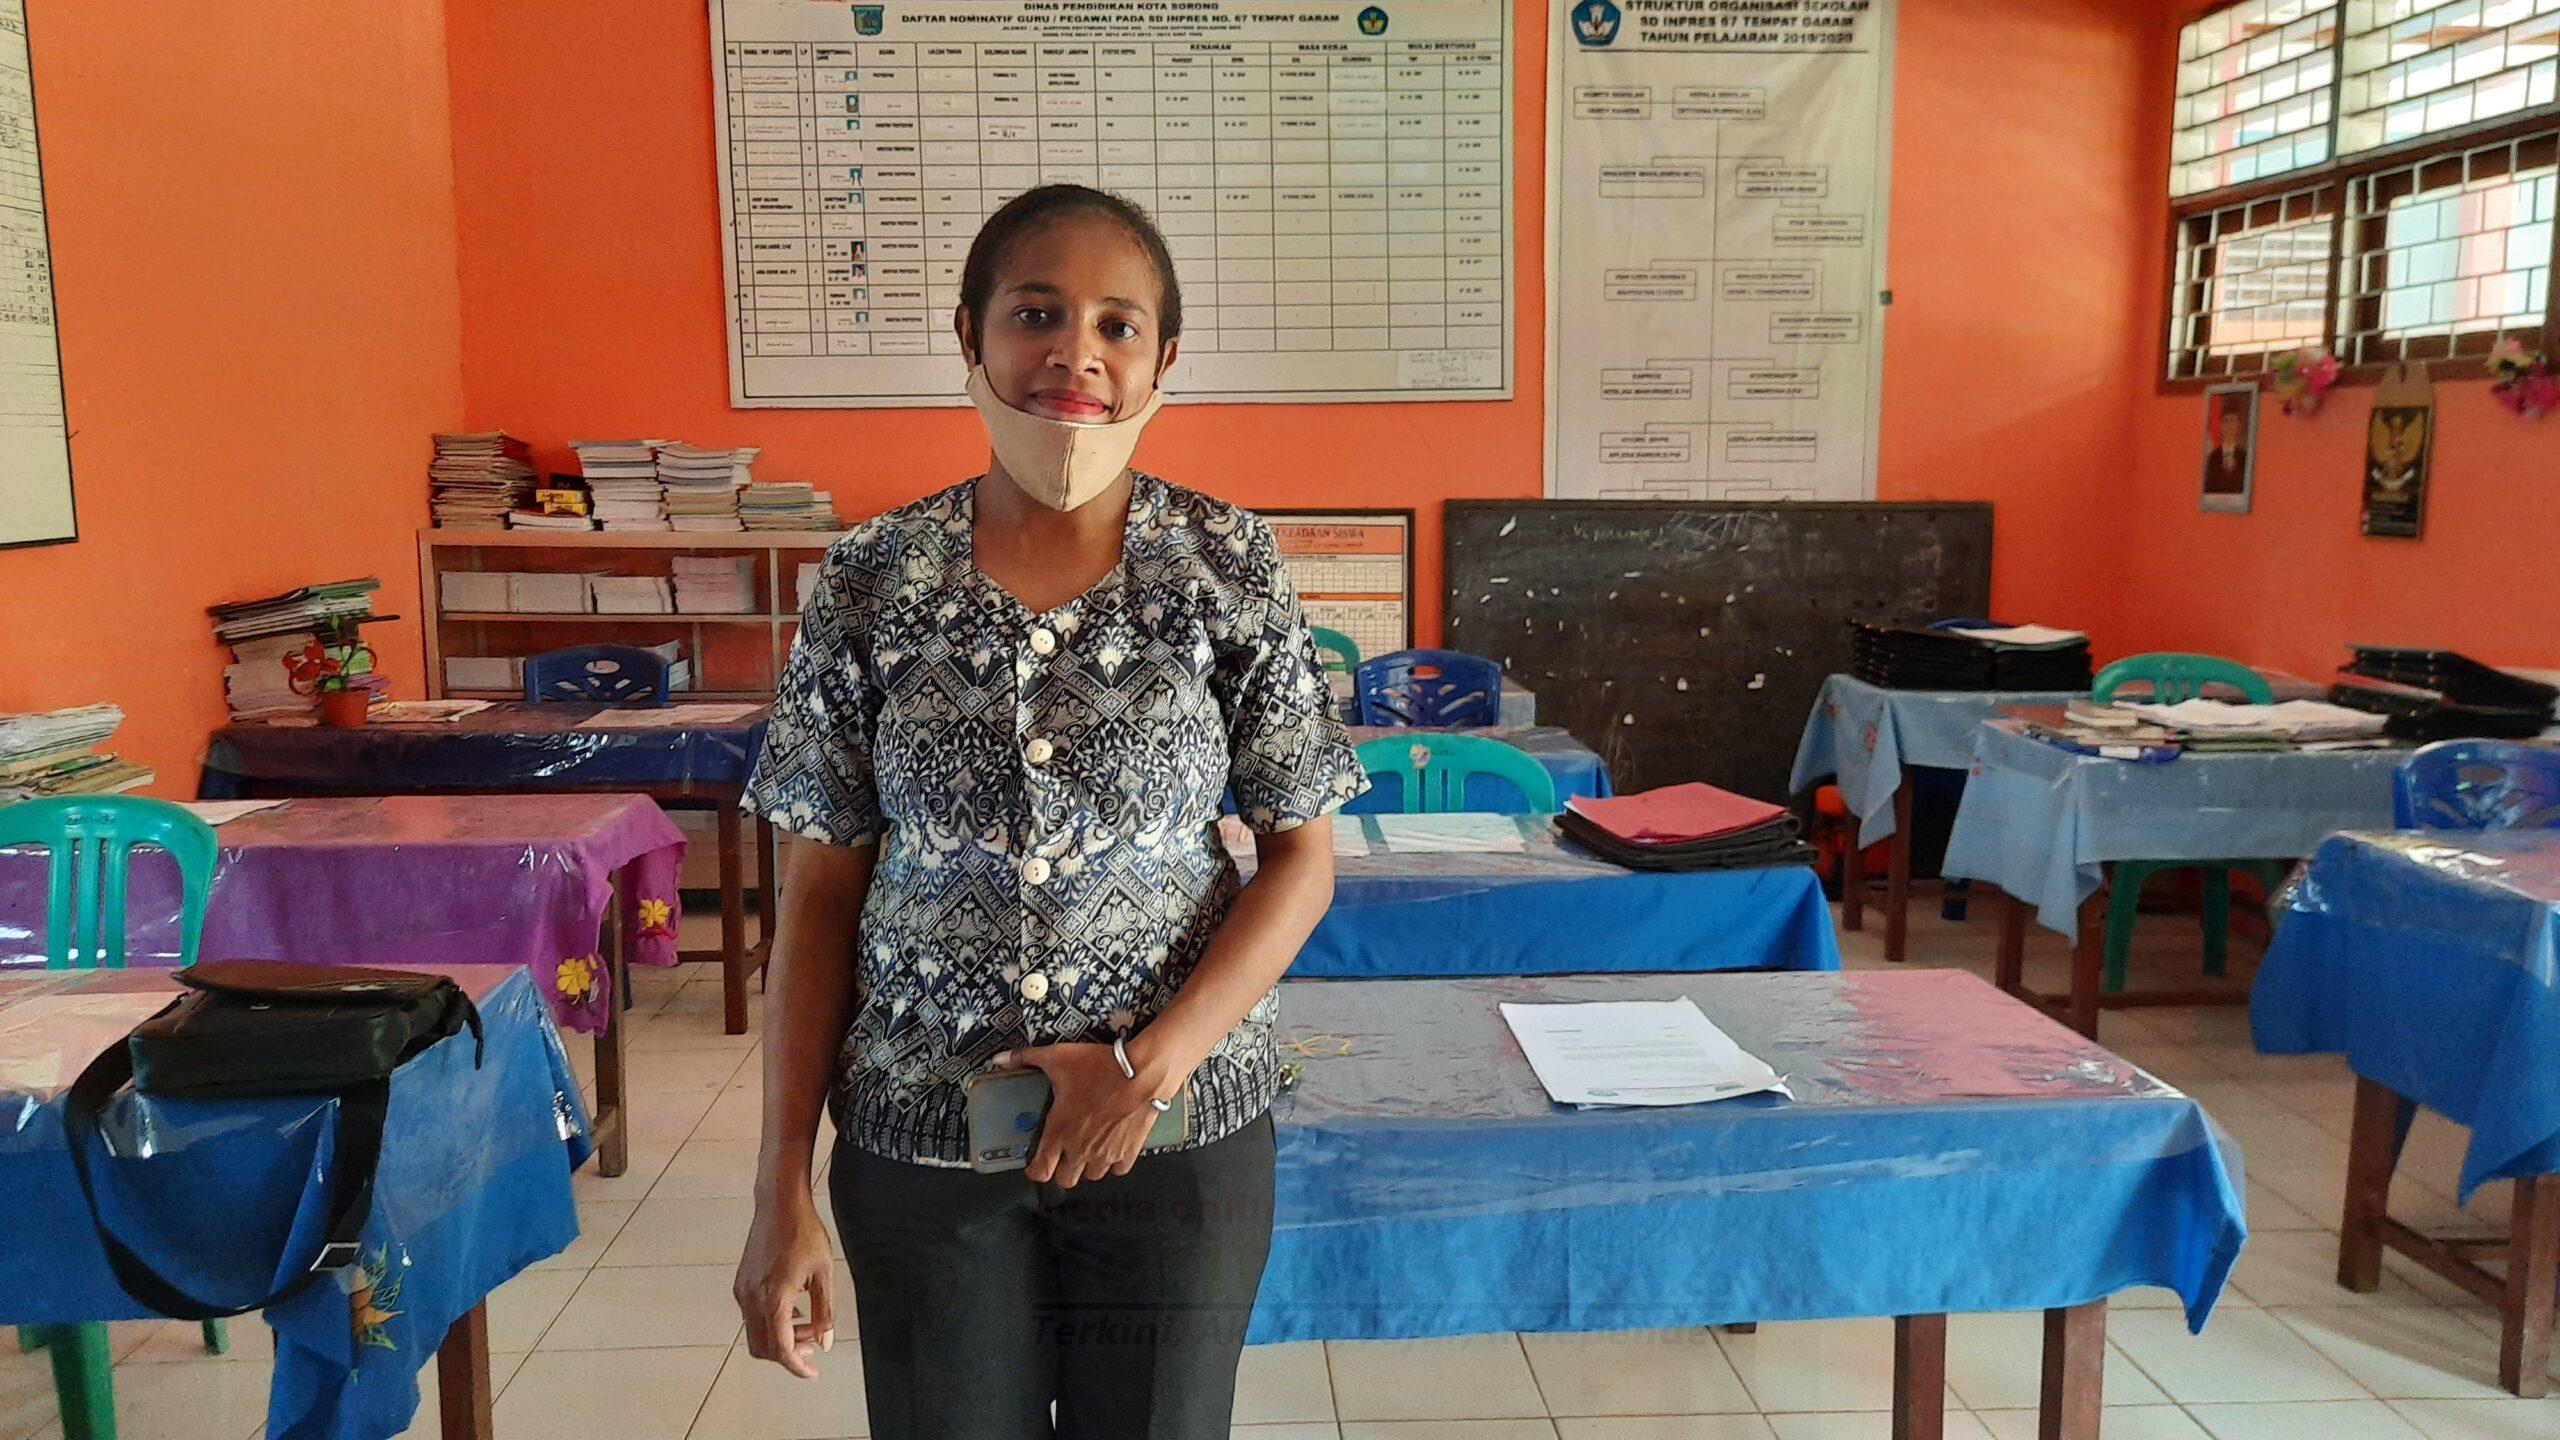 3 Sekolah di Kota Sorong Dapat Bantuan Puluhan Alat TIK Melalui Usulan Rico Sia 3 20201021 115354 scaled